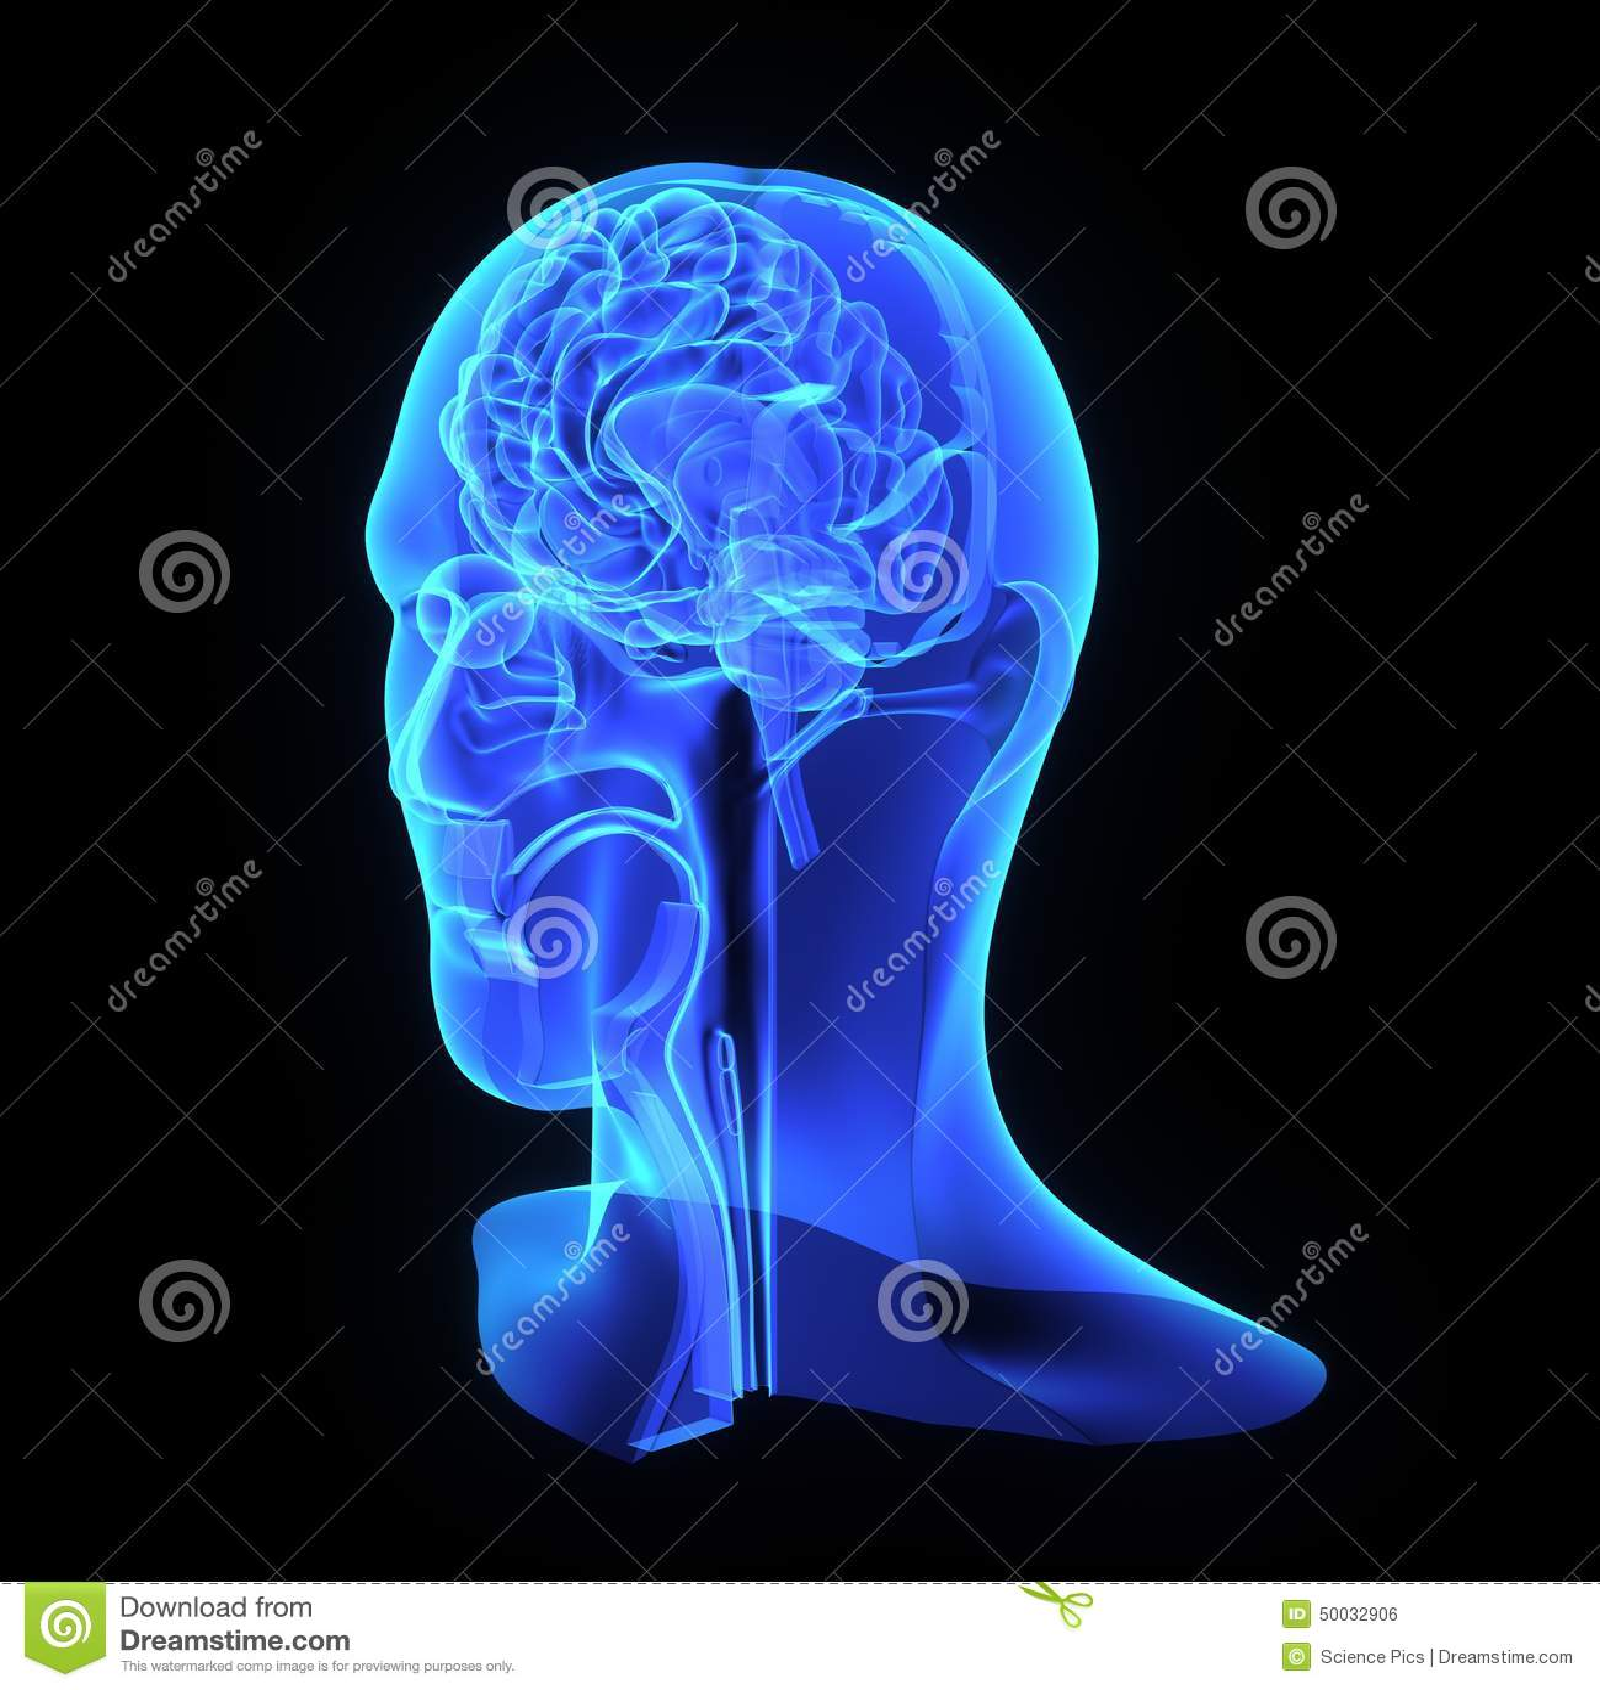 Head and neck anatomy stock illustration. Illustration of head ...